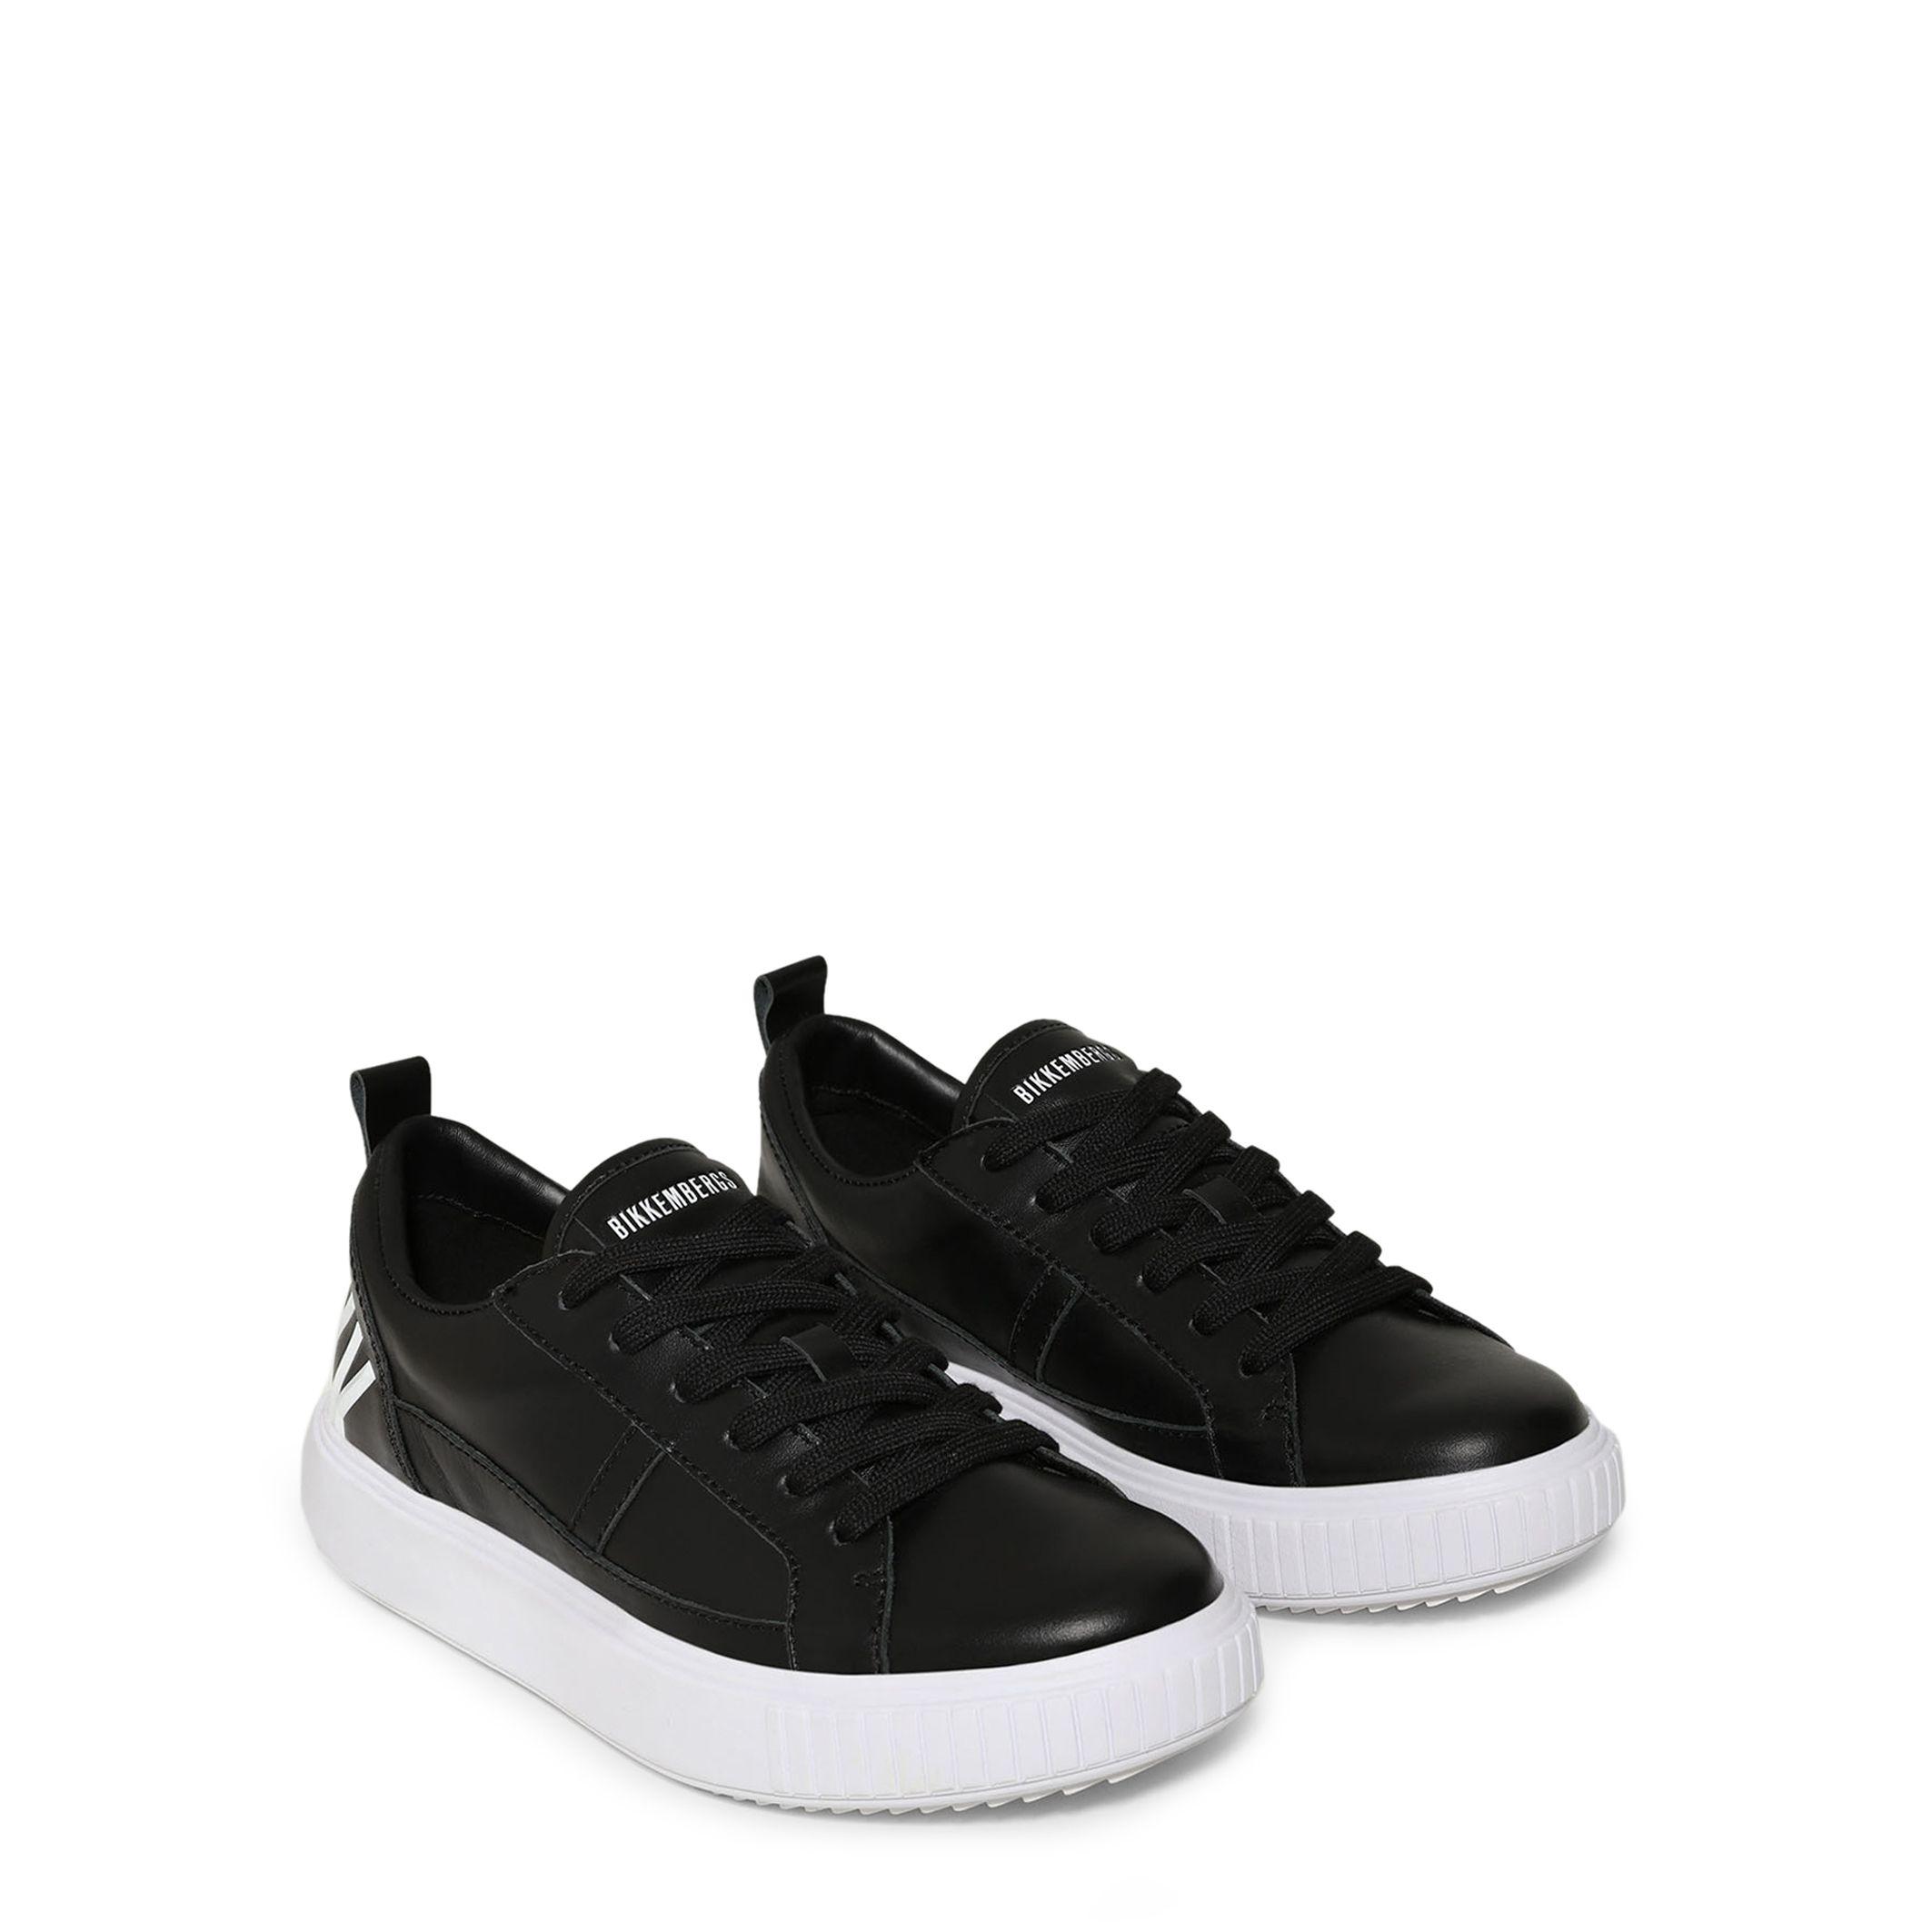 Sneakers Bikkembergs – B4BKW0034